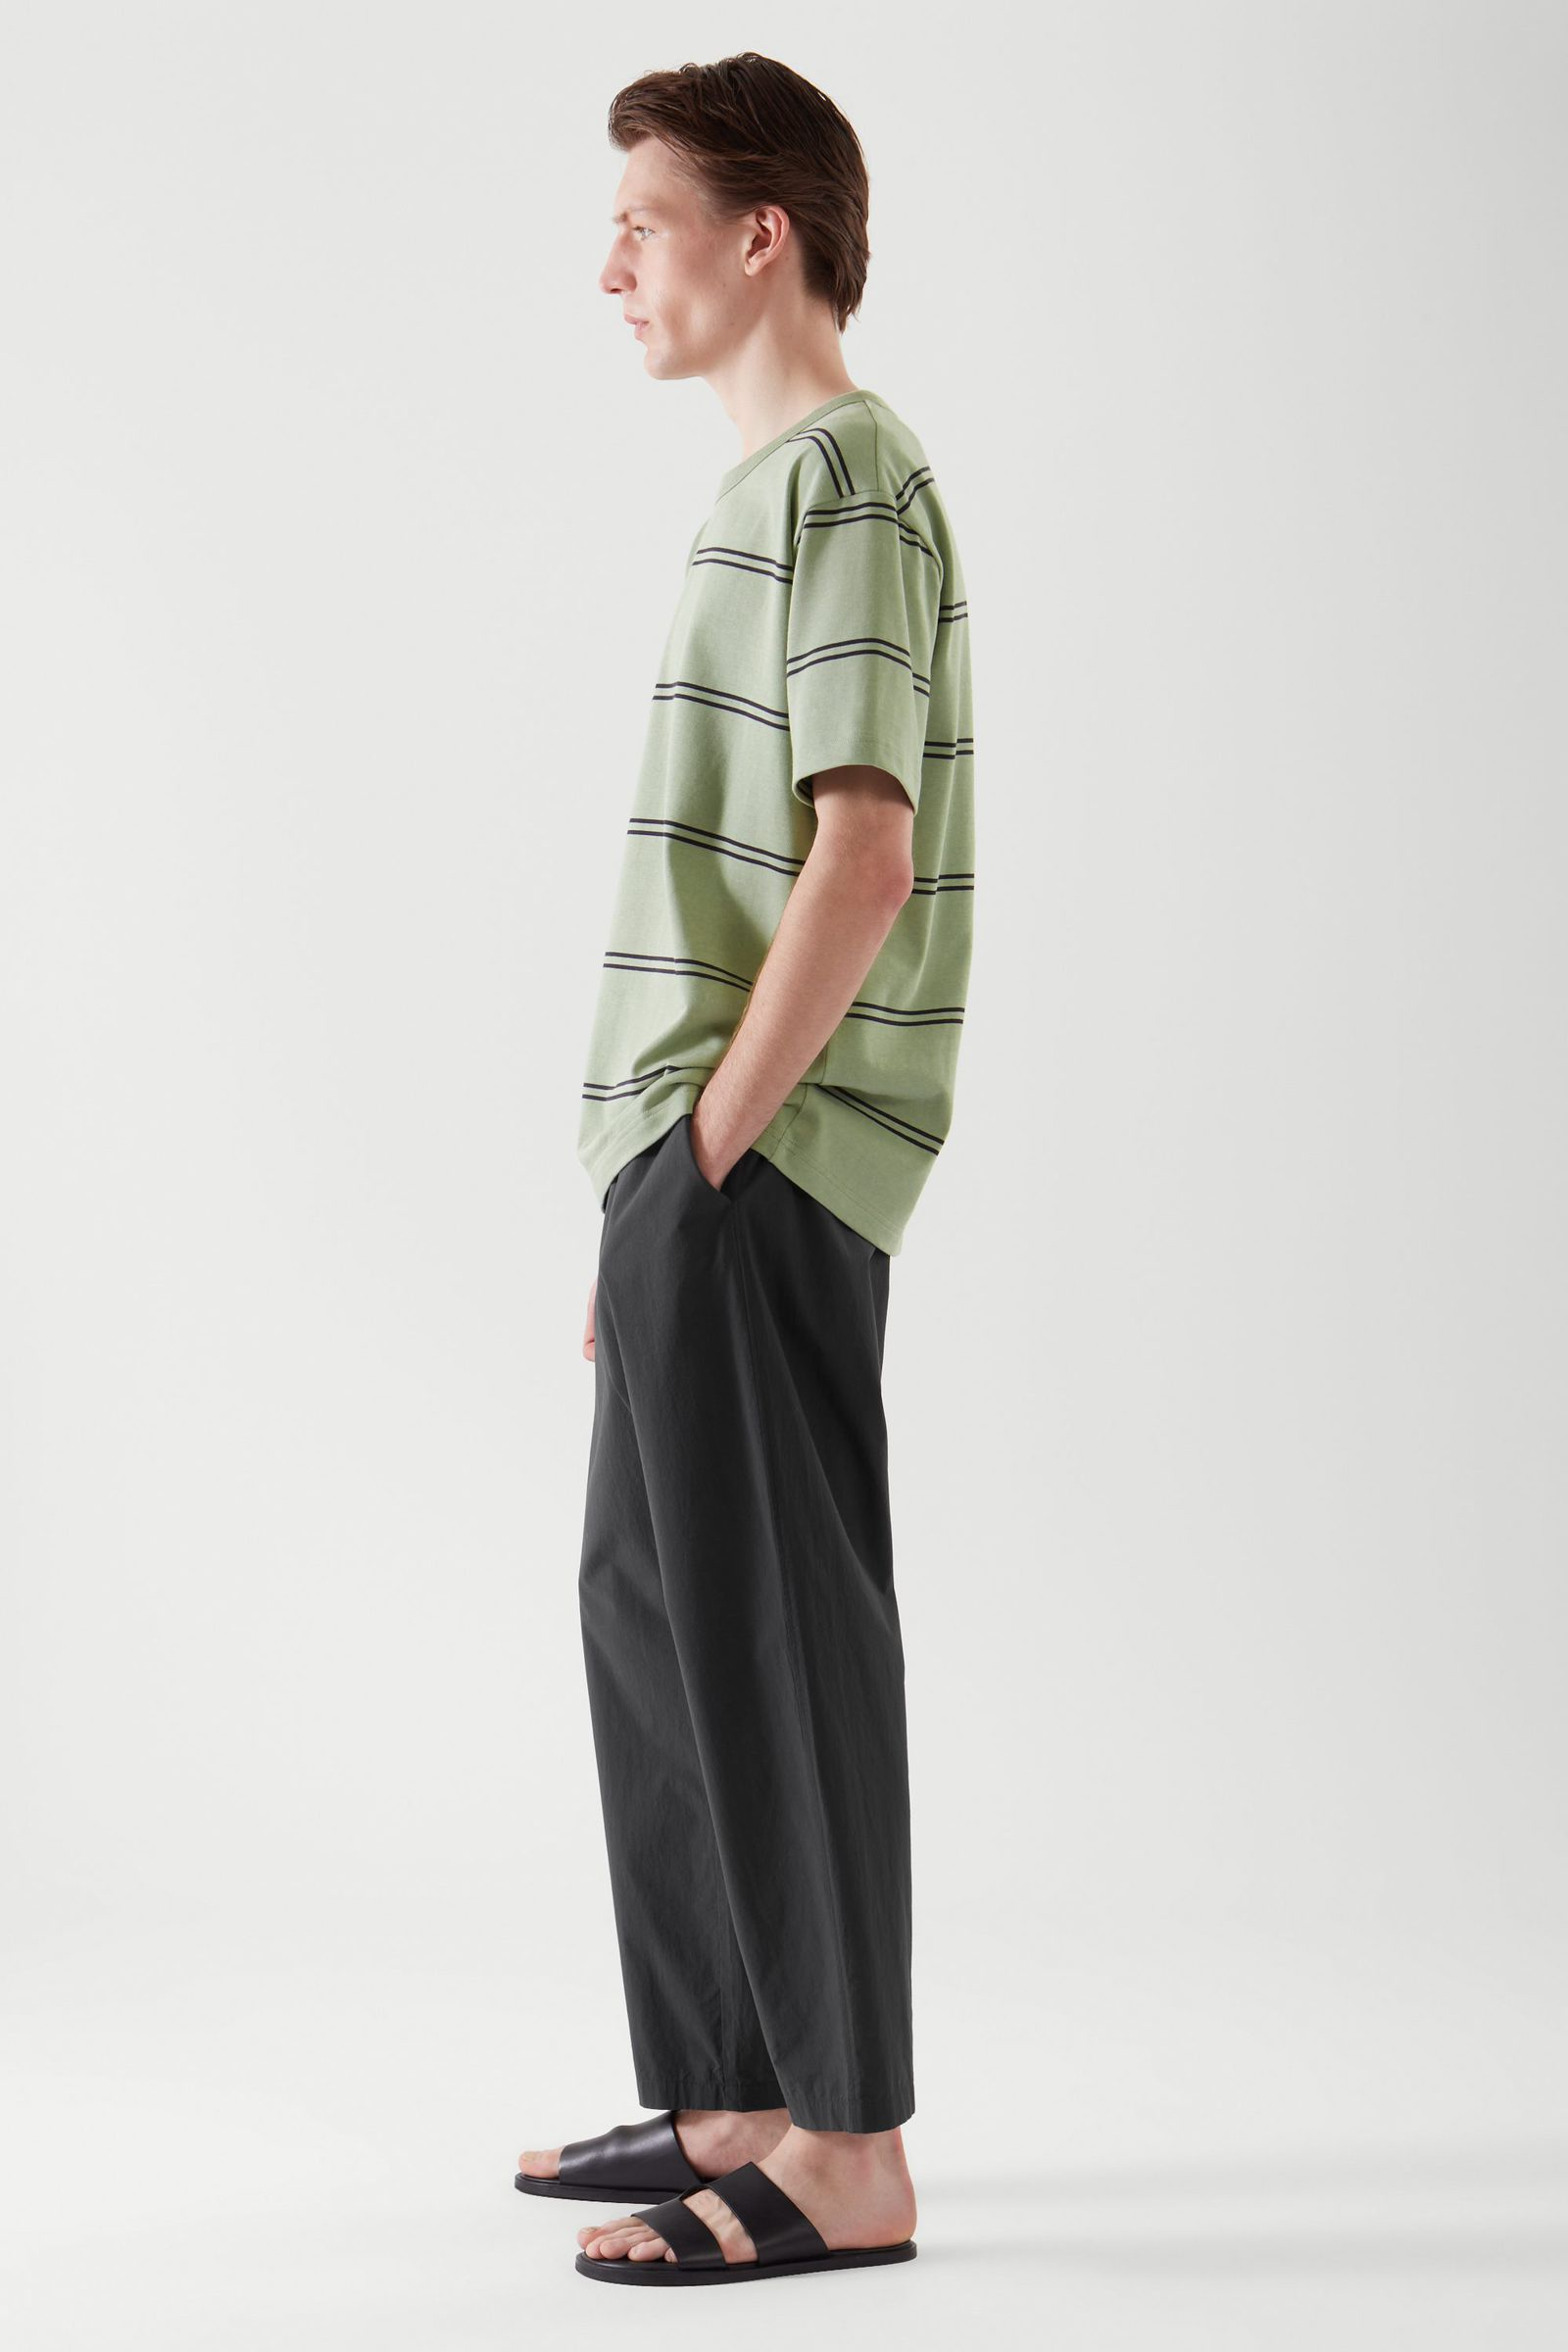 COS 릴랙스드 핏 티셔츠의 라이트 카키 그린 / 블랙컬러 ECOMLook입니다.